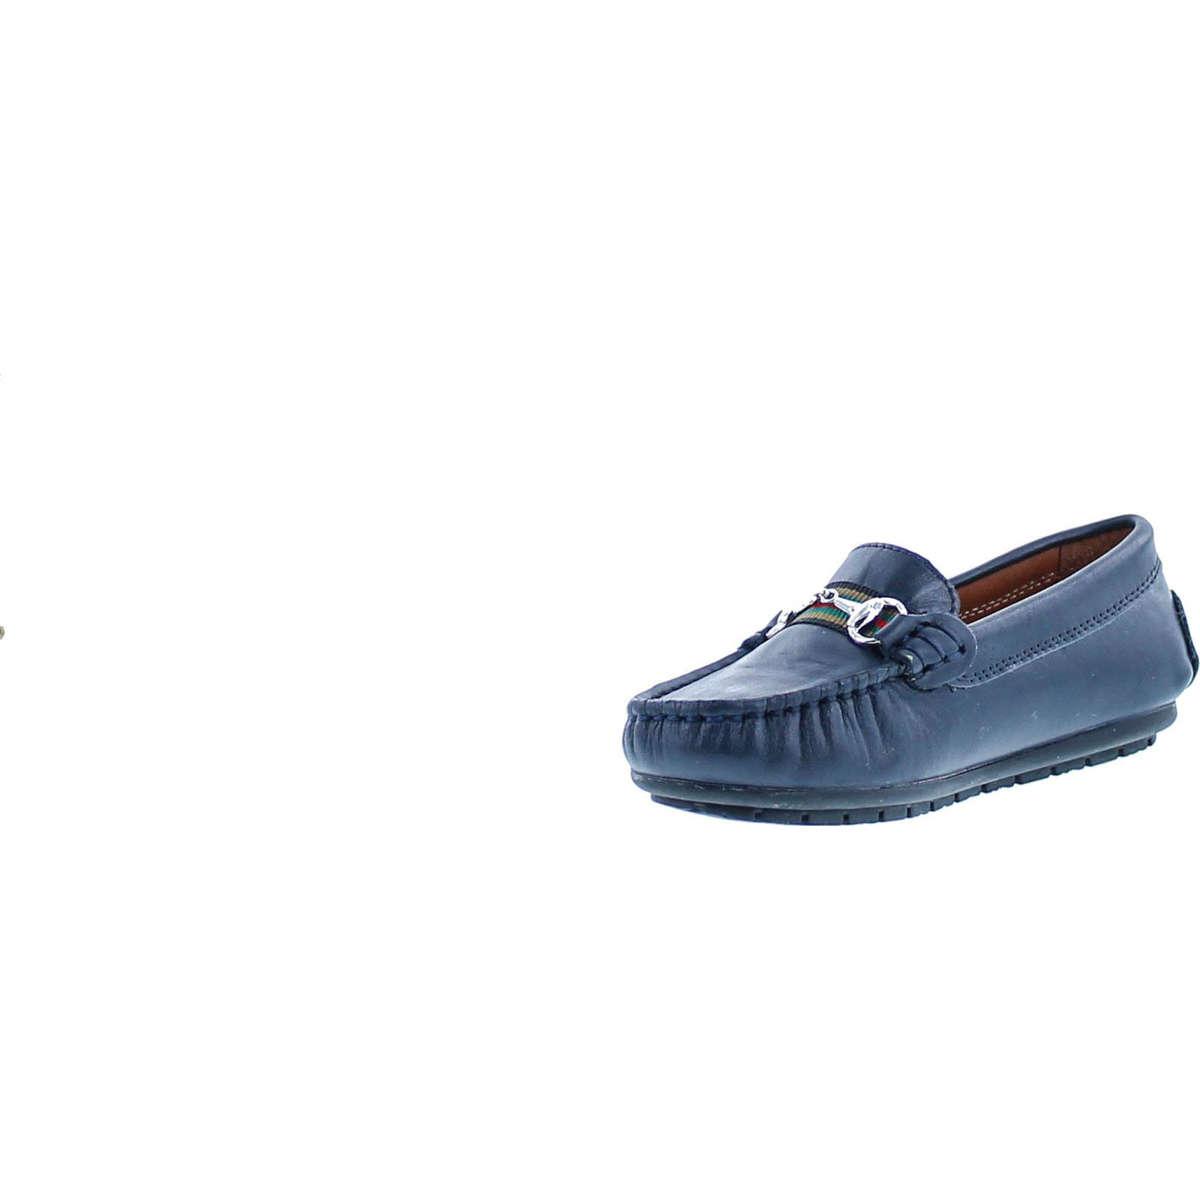 venettini boys 55 toby designer buckle slip on casual